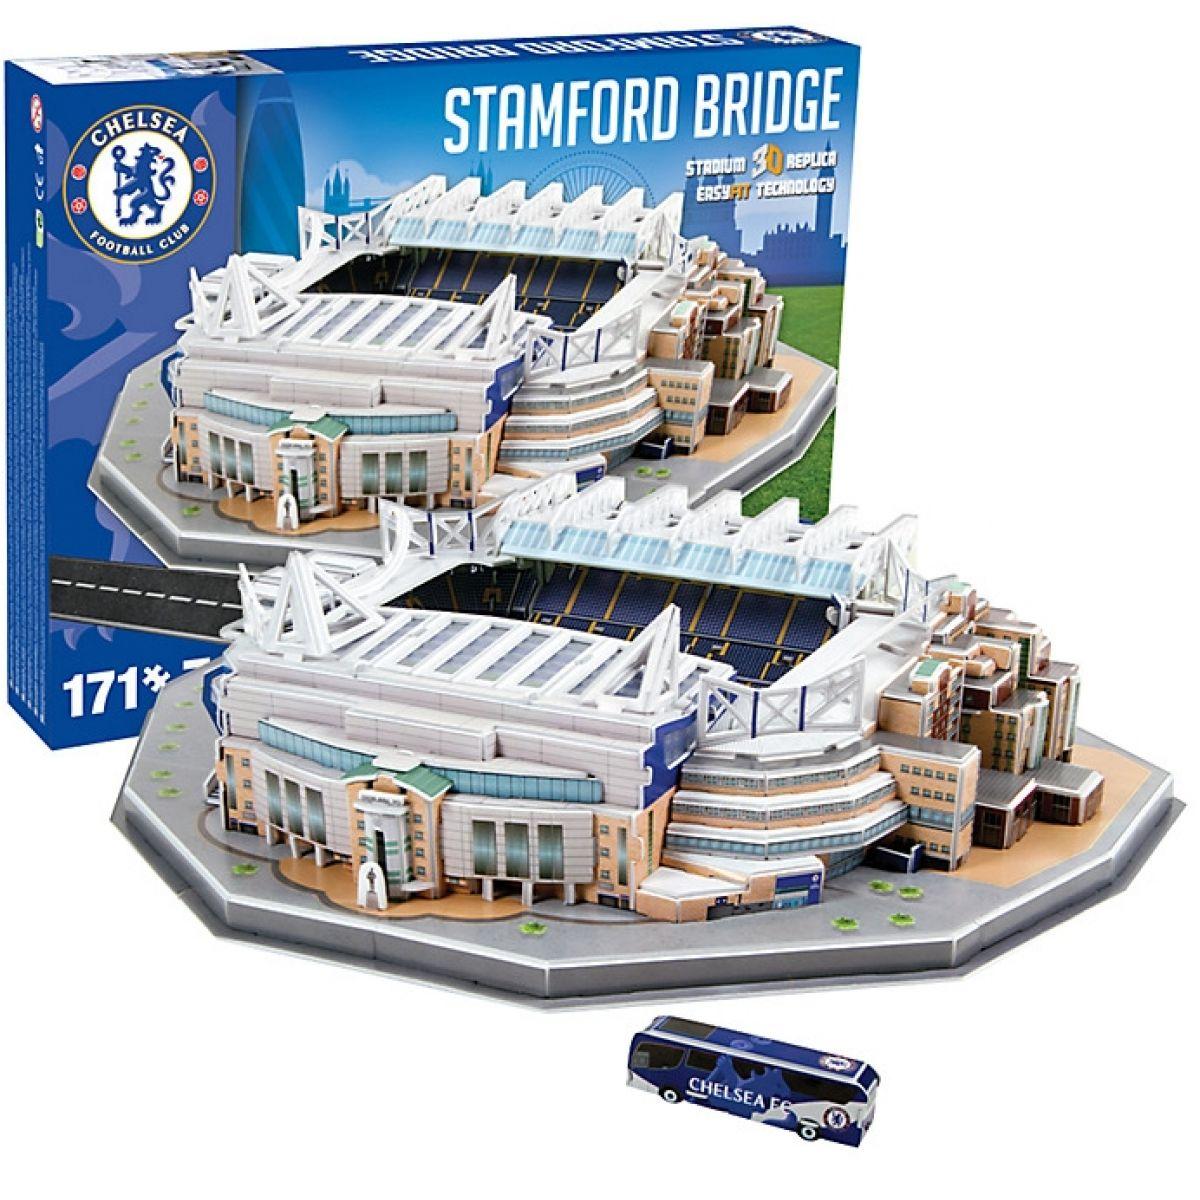 Nanostad 3D Puzzle Stamford Bridge - Chelsea